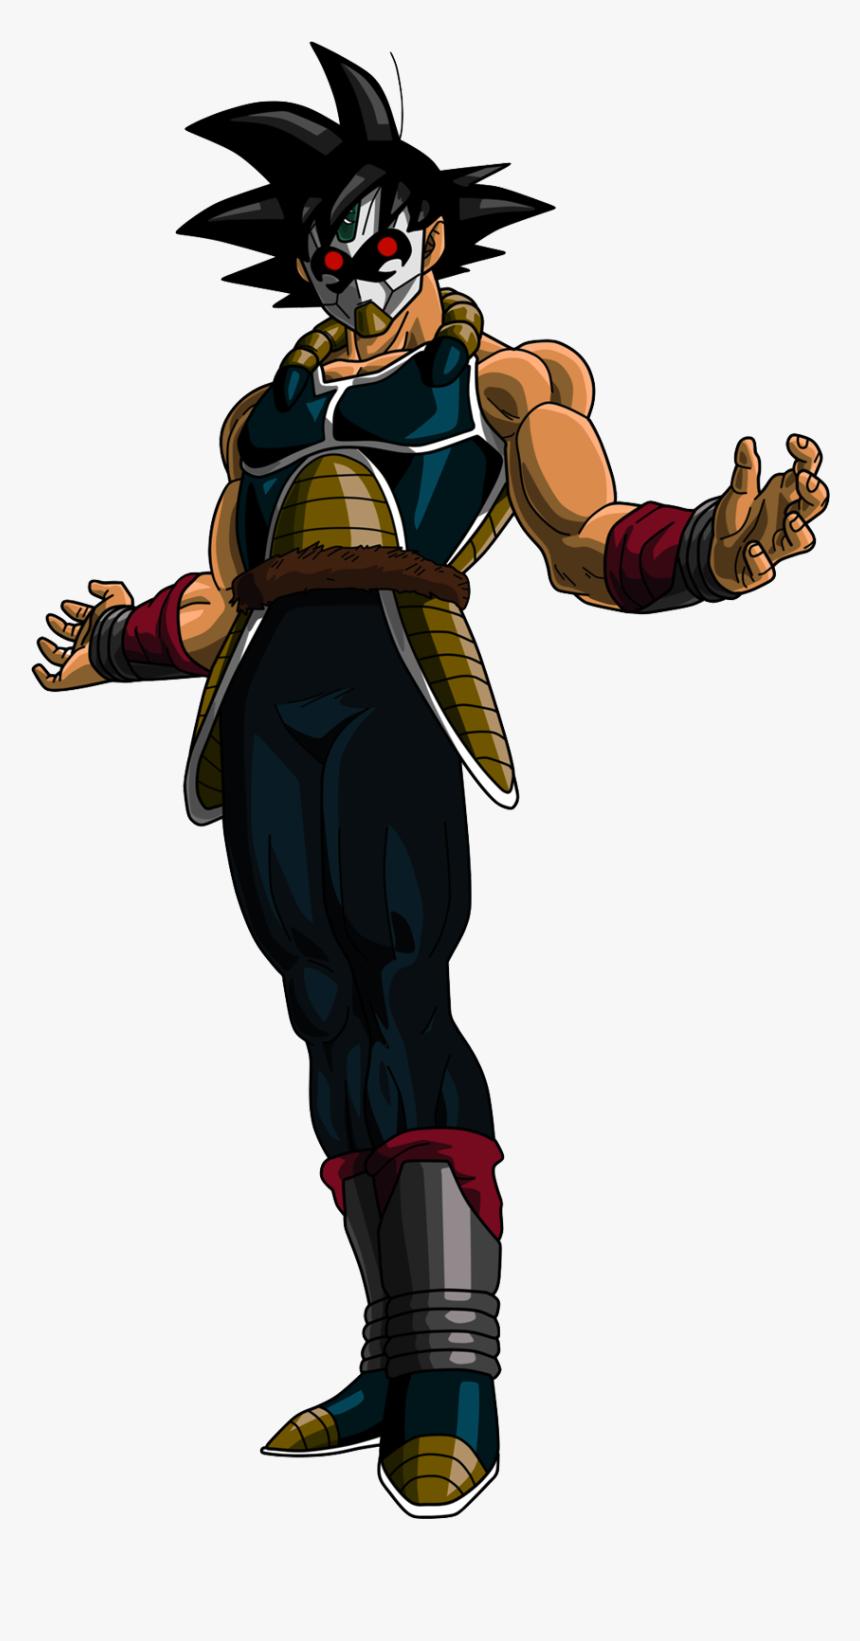 Bardock Drawing Time Breaker Huge Freebie Download - Bardock Super Dragon Ball Heroes, HD Png Download, Free Download